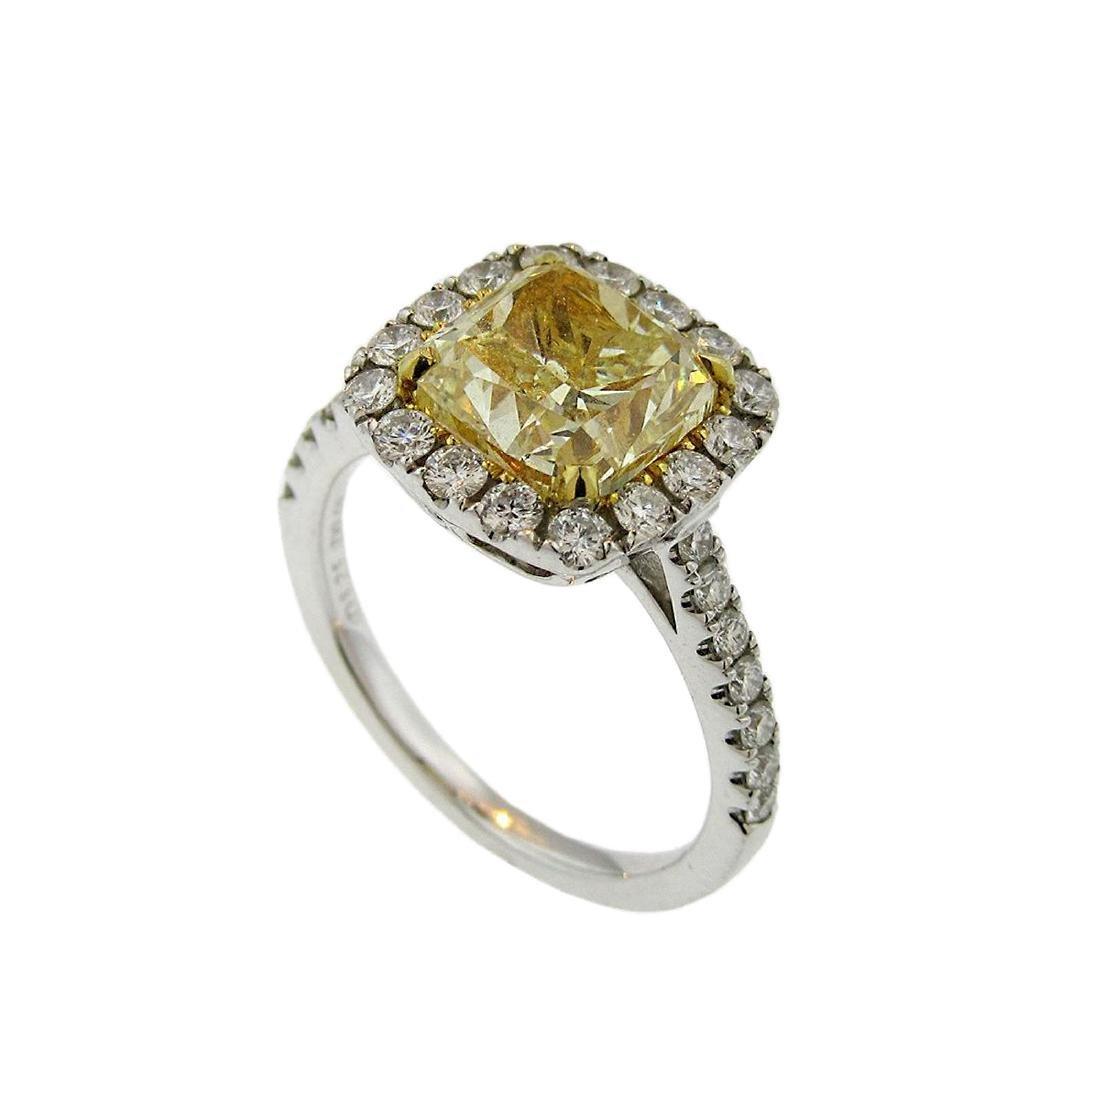 Cushion Fancy Yellow Diamond Halo Engagement Ring - 5